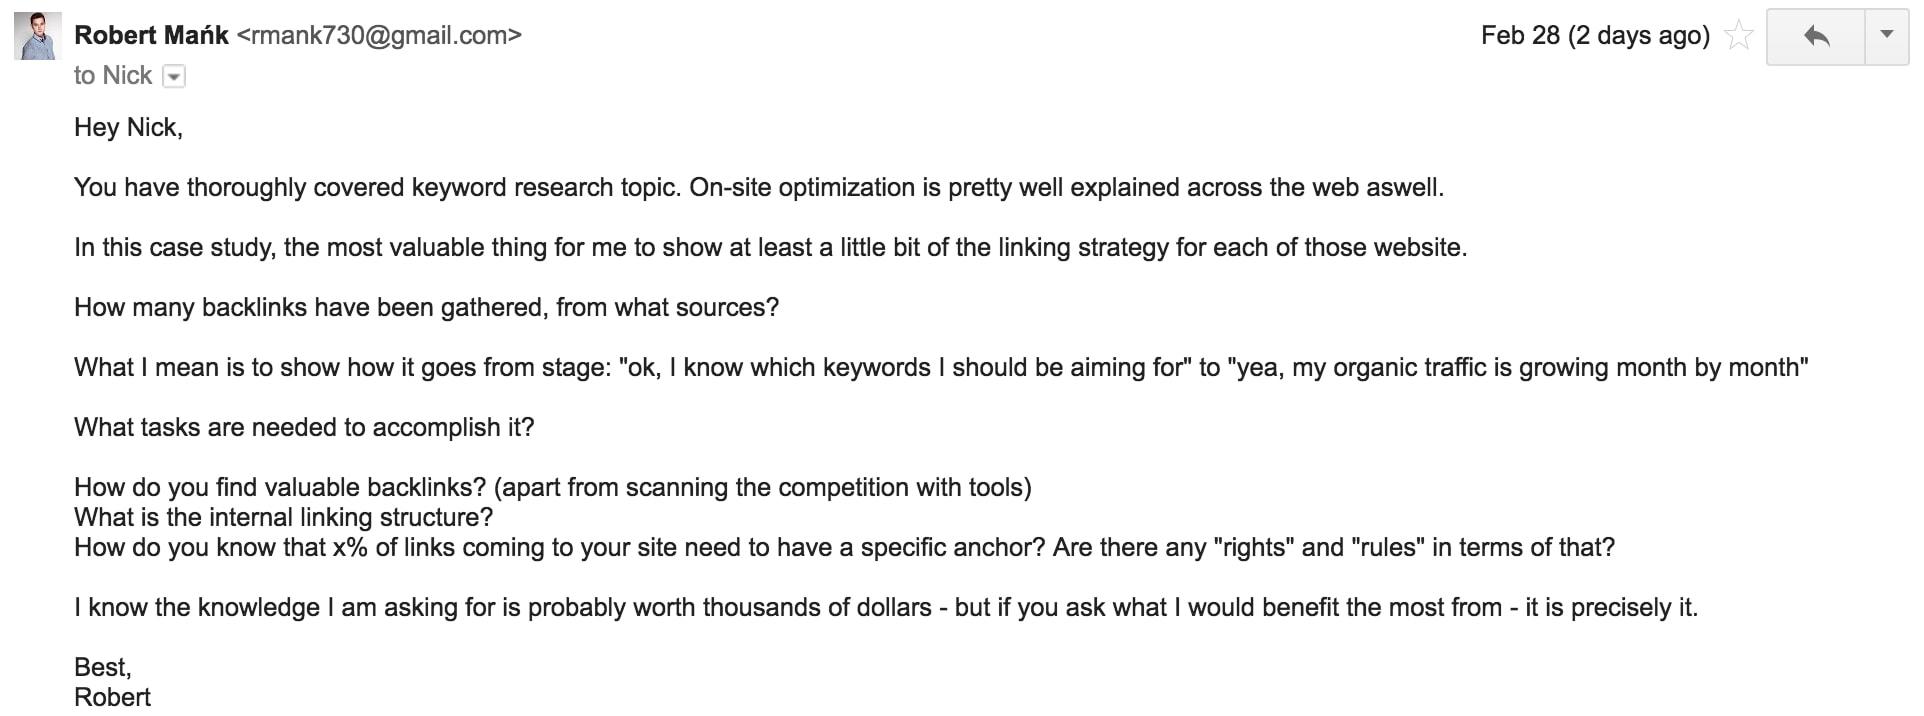 Introduction speech example essay image 7